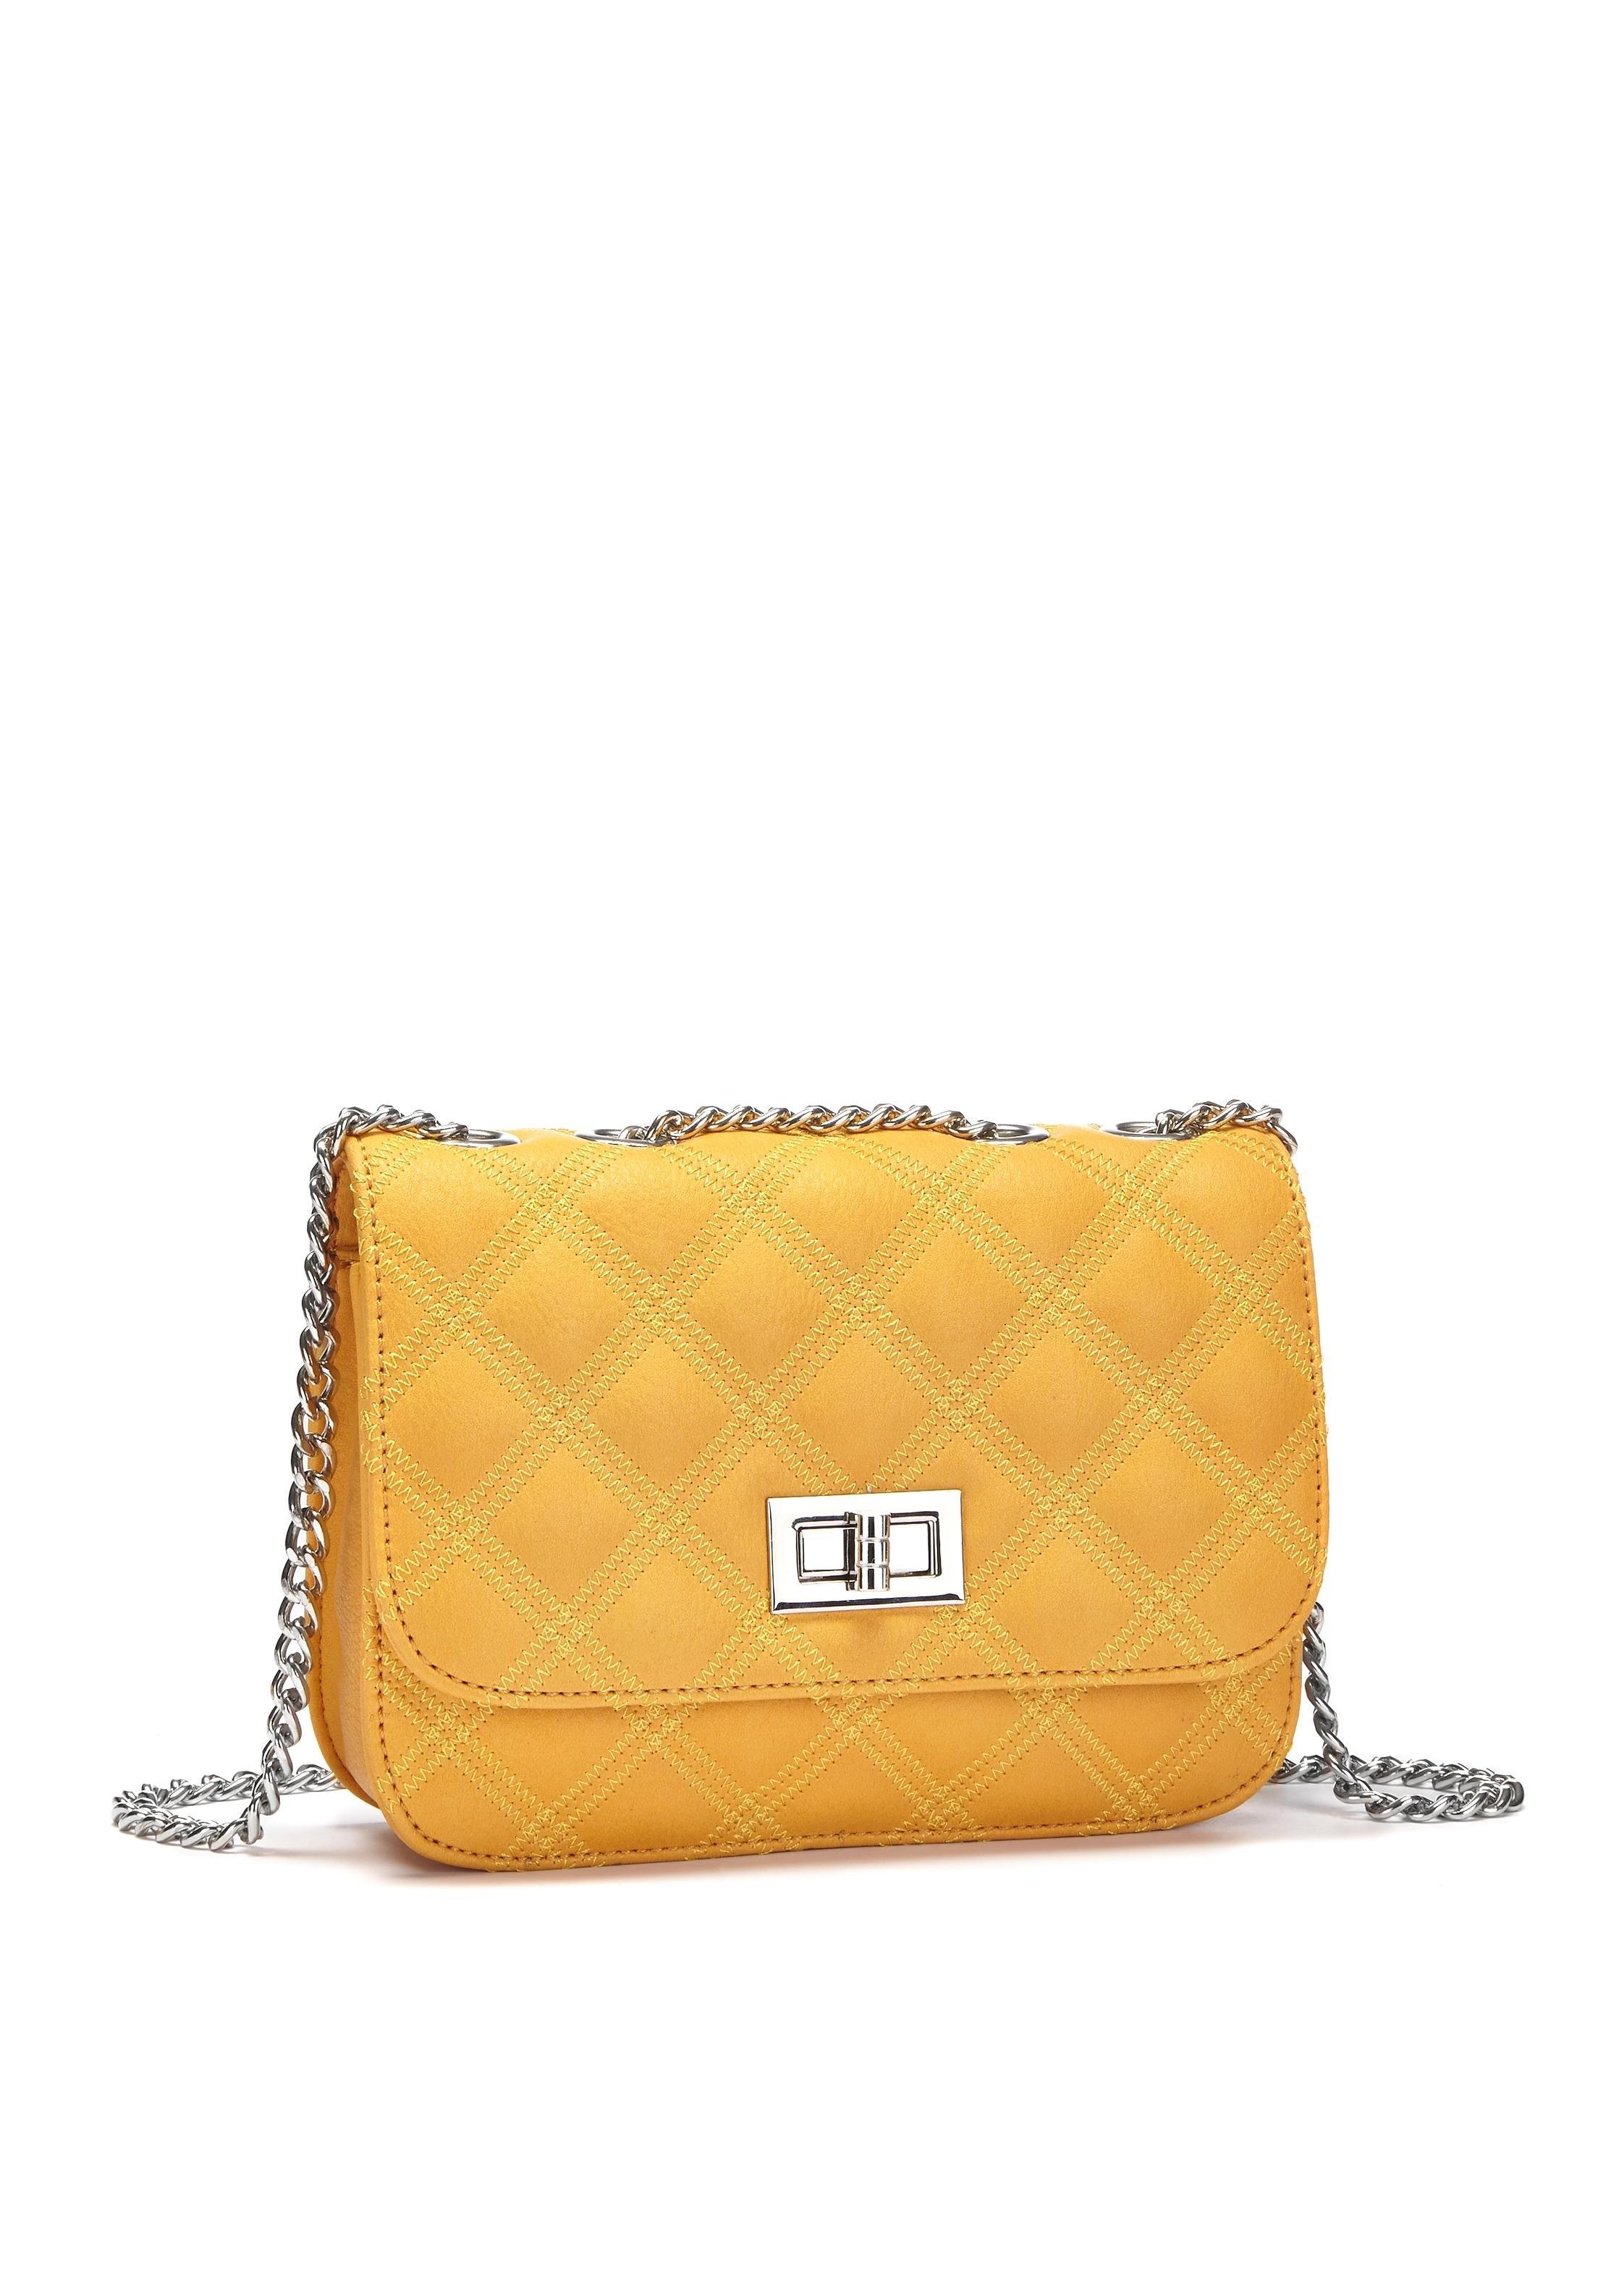 LASCANA mini-bag - verschillende betaalmethodes